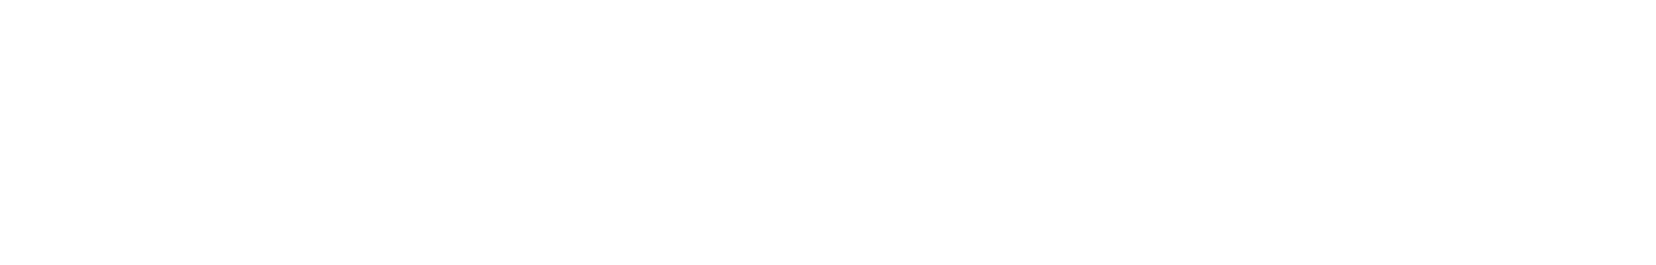 GoldenSpread.png